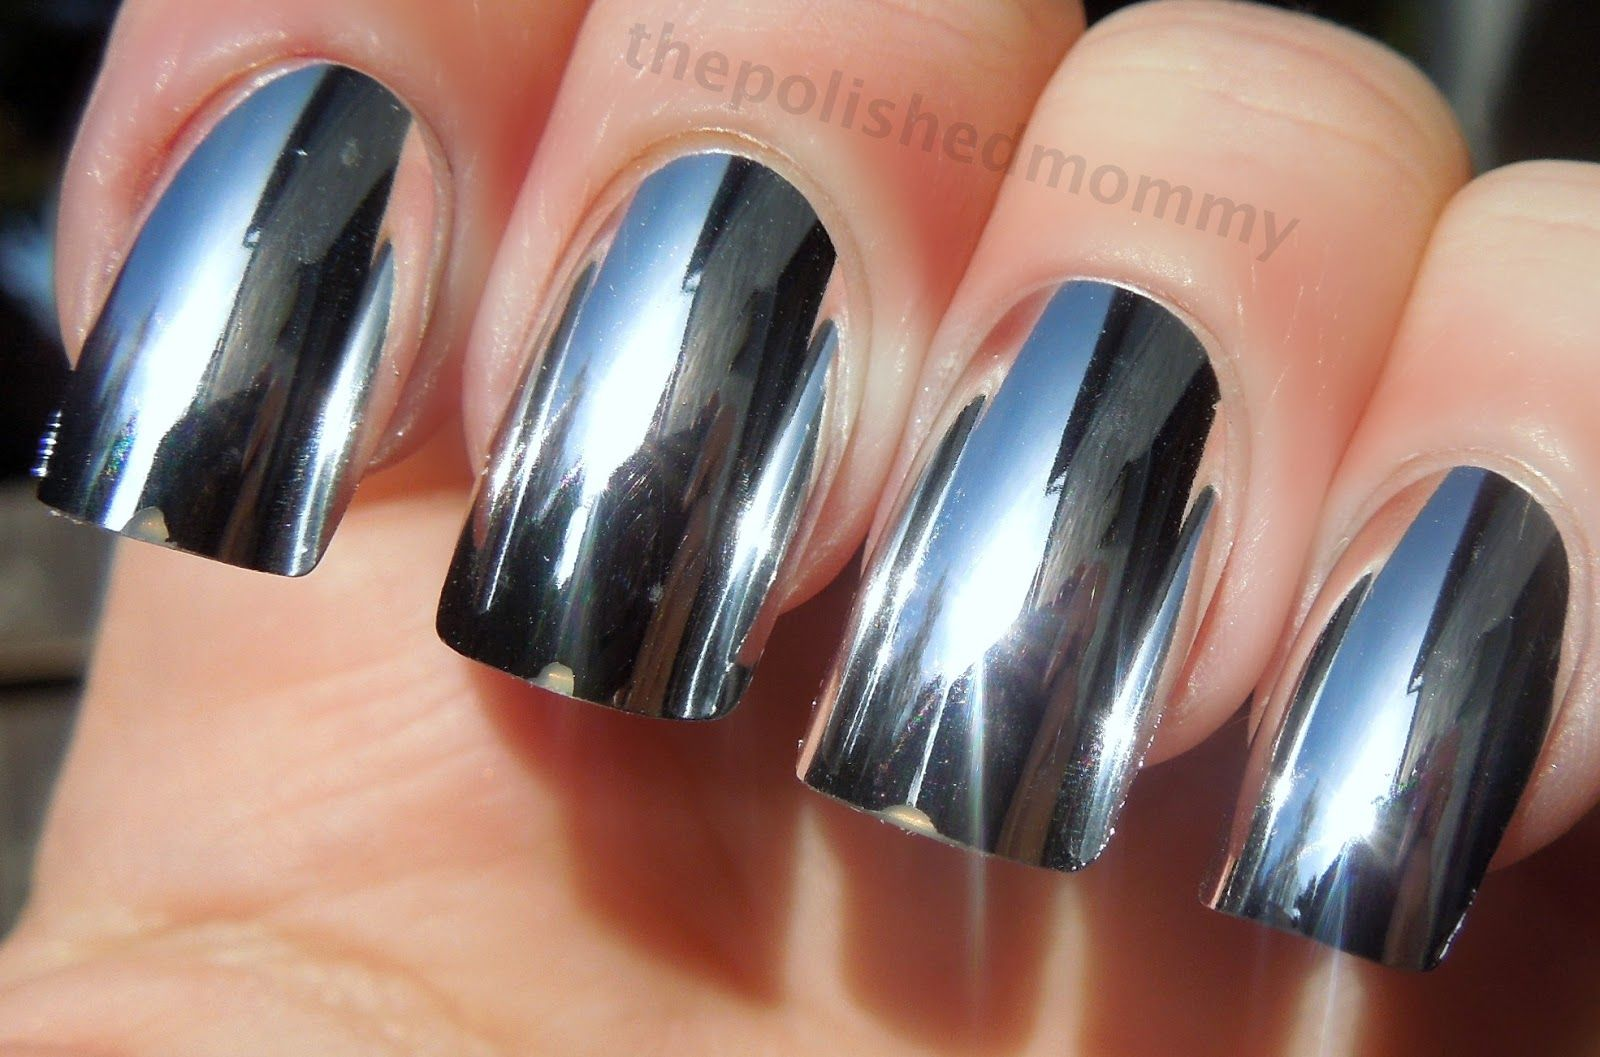 sephora mirror nail polish   Nails   Pinterest